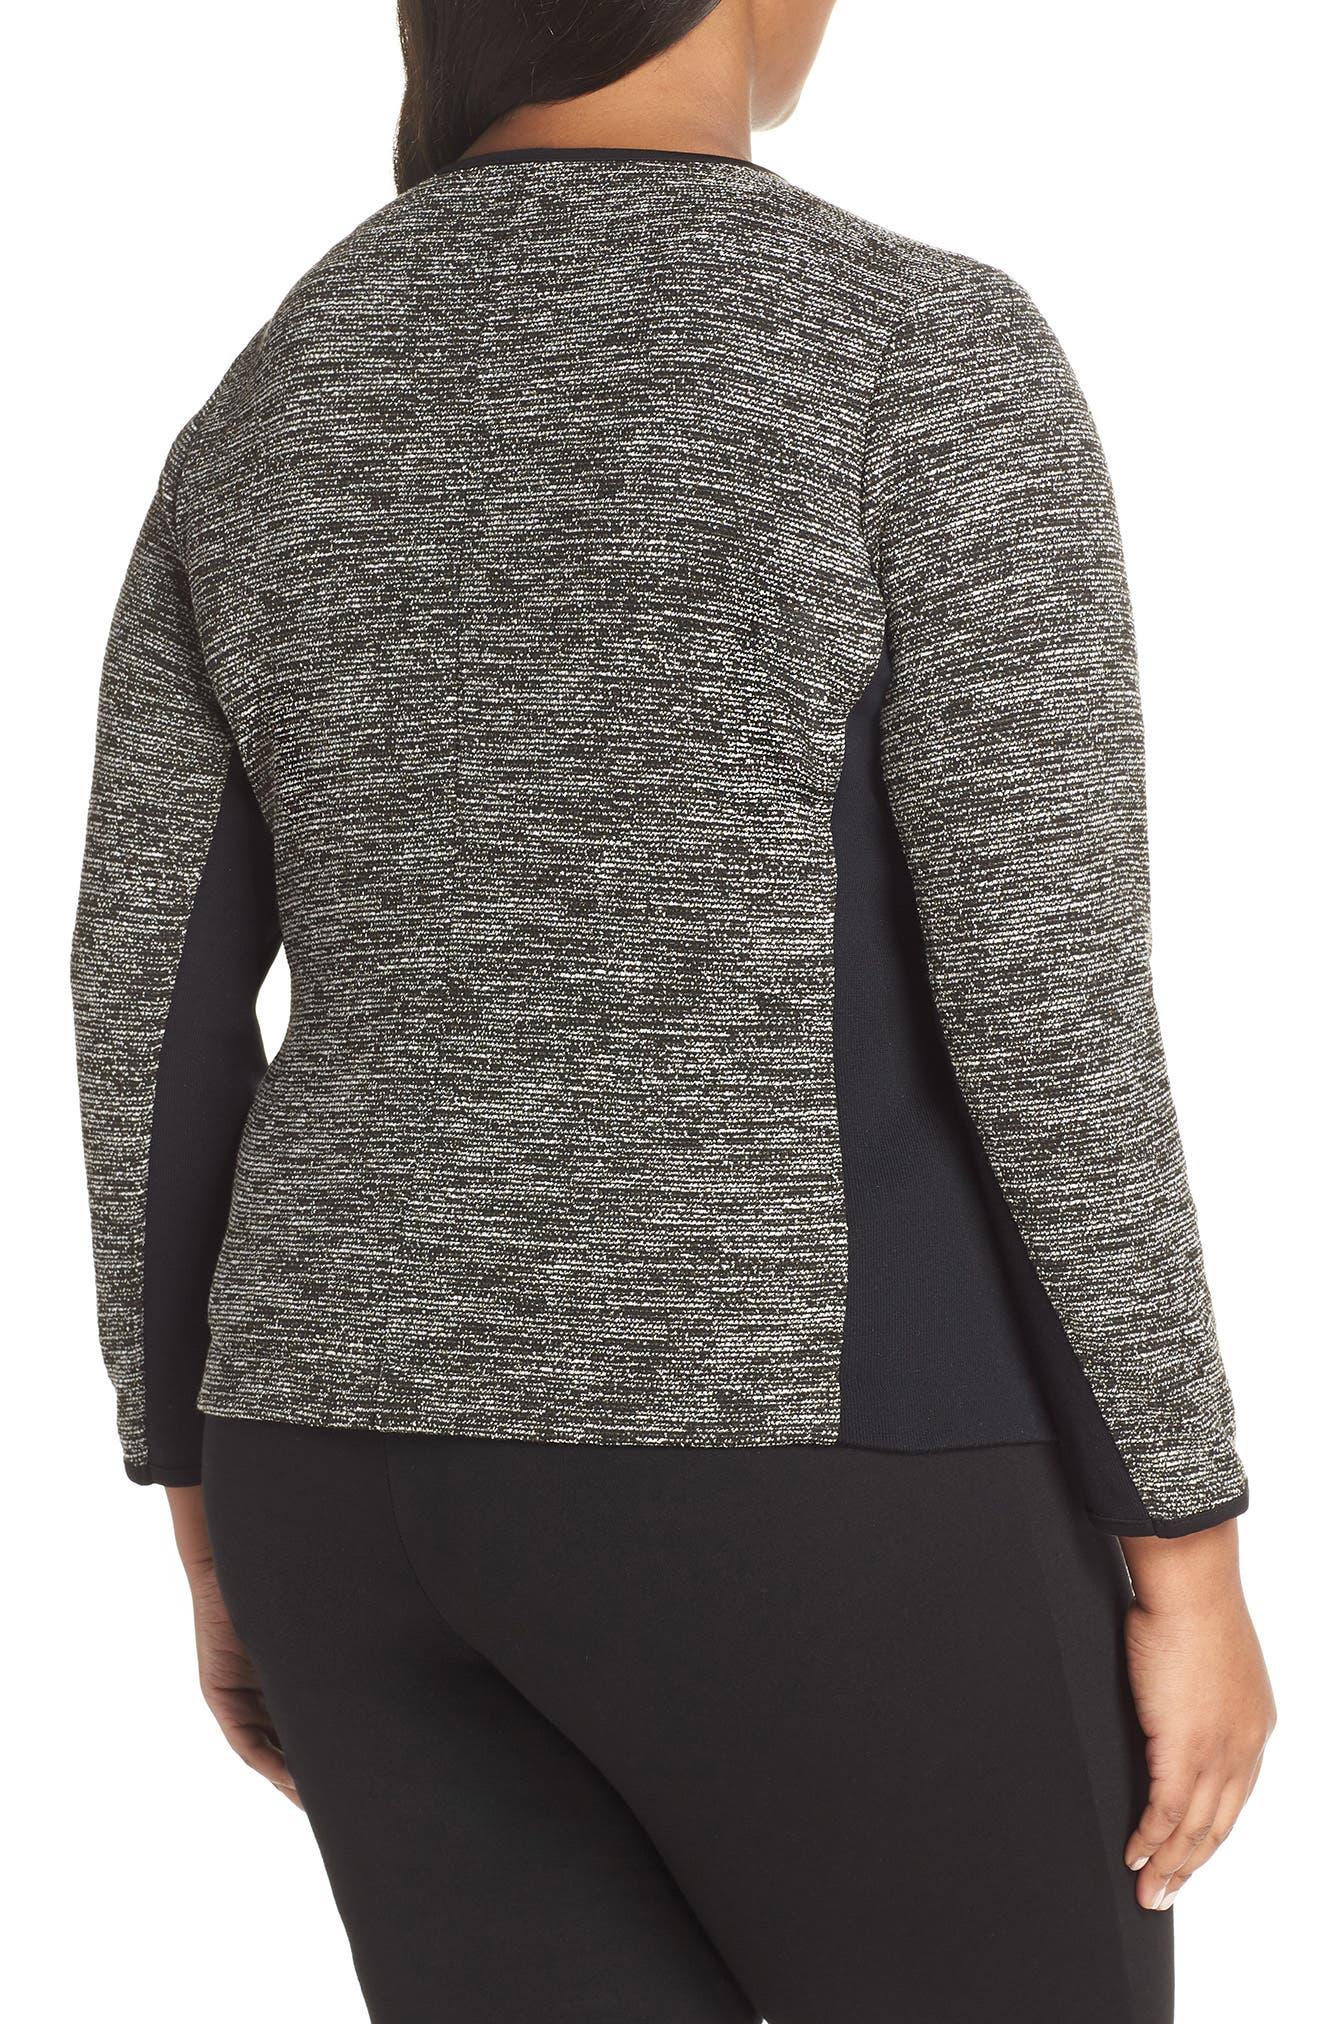 Mix Media Knit Jacket,                             Alternate thumbnail 2, color,                             BLACK TWEED